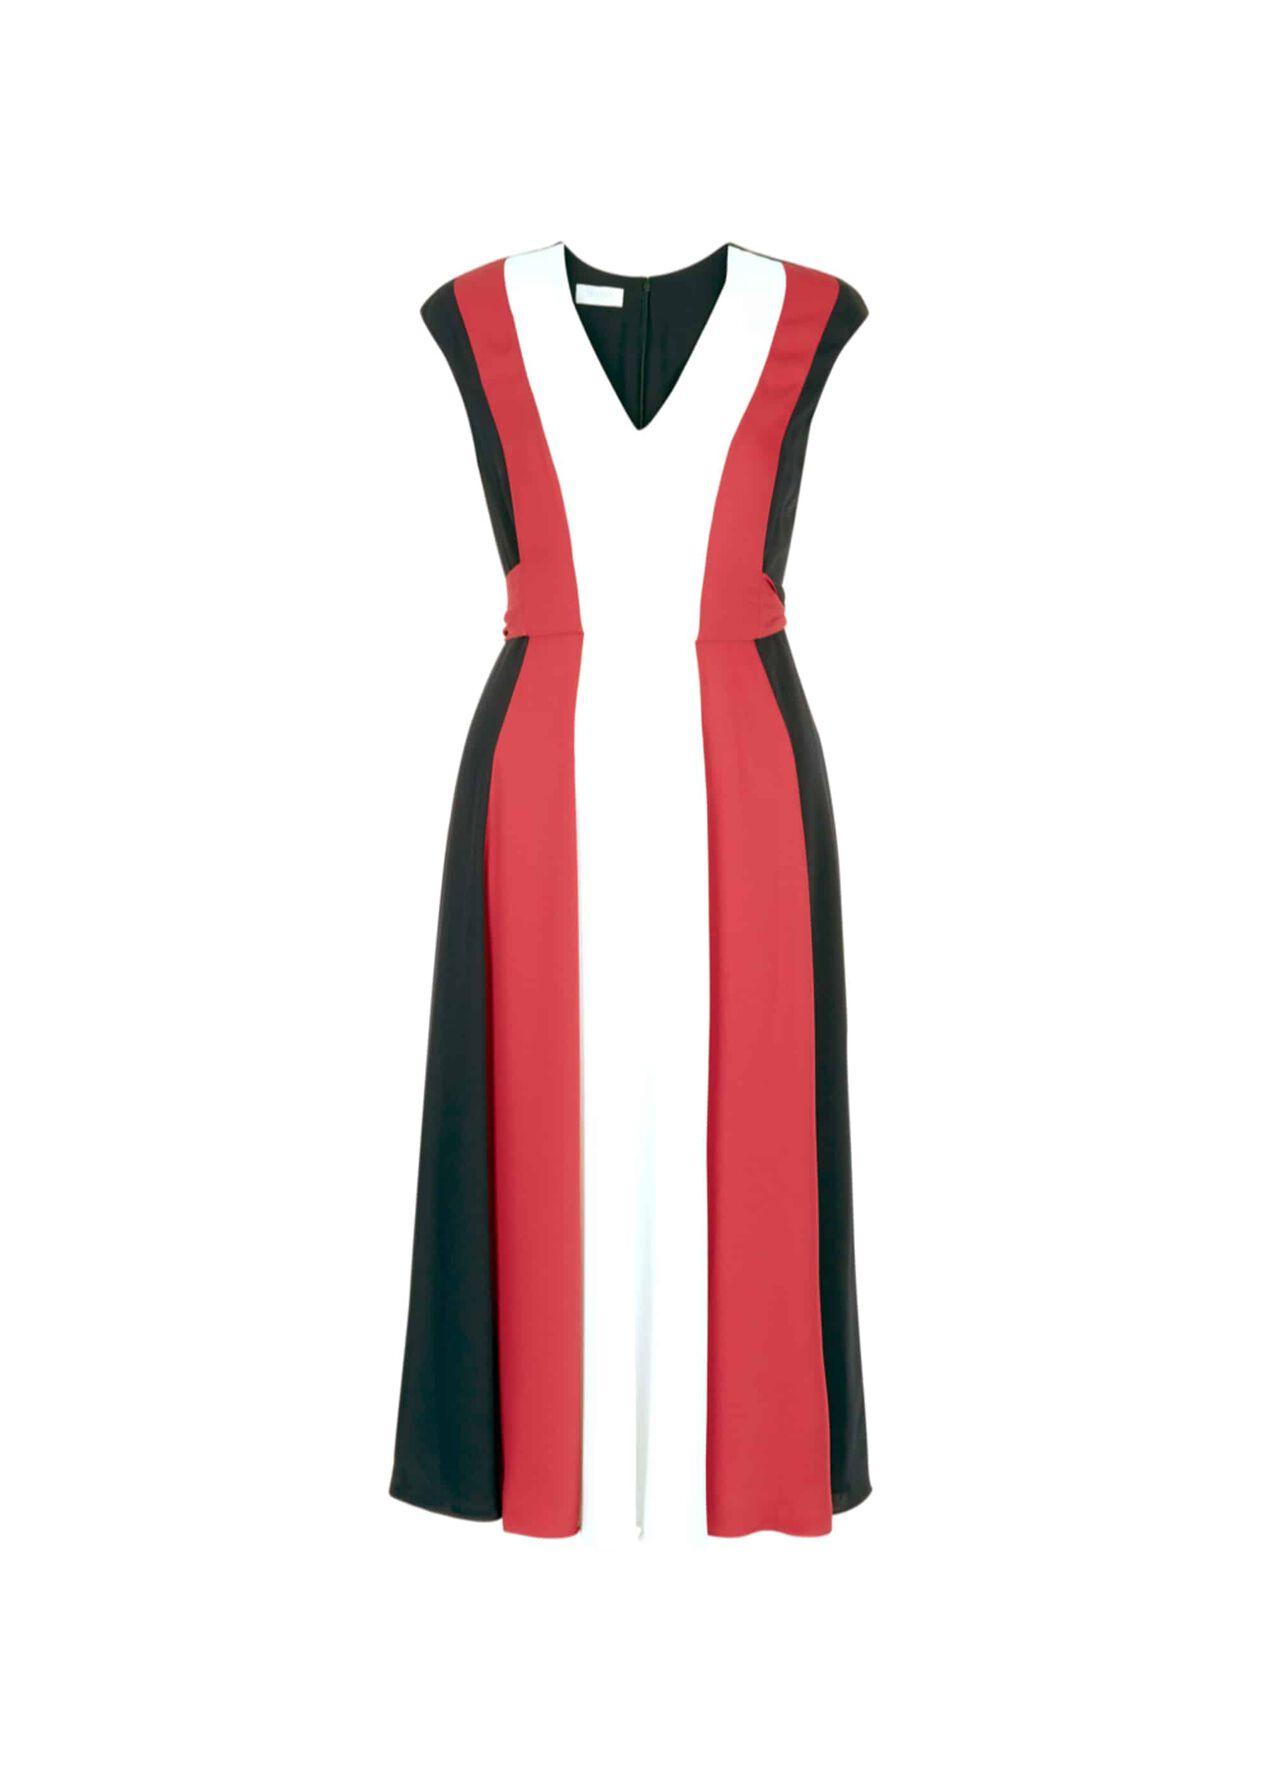 Bailly Dress Navy Ivory Pink